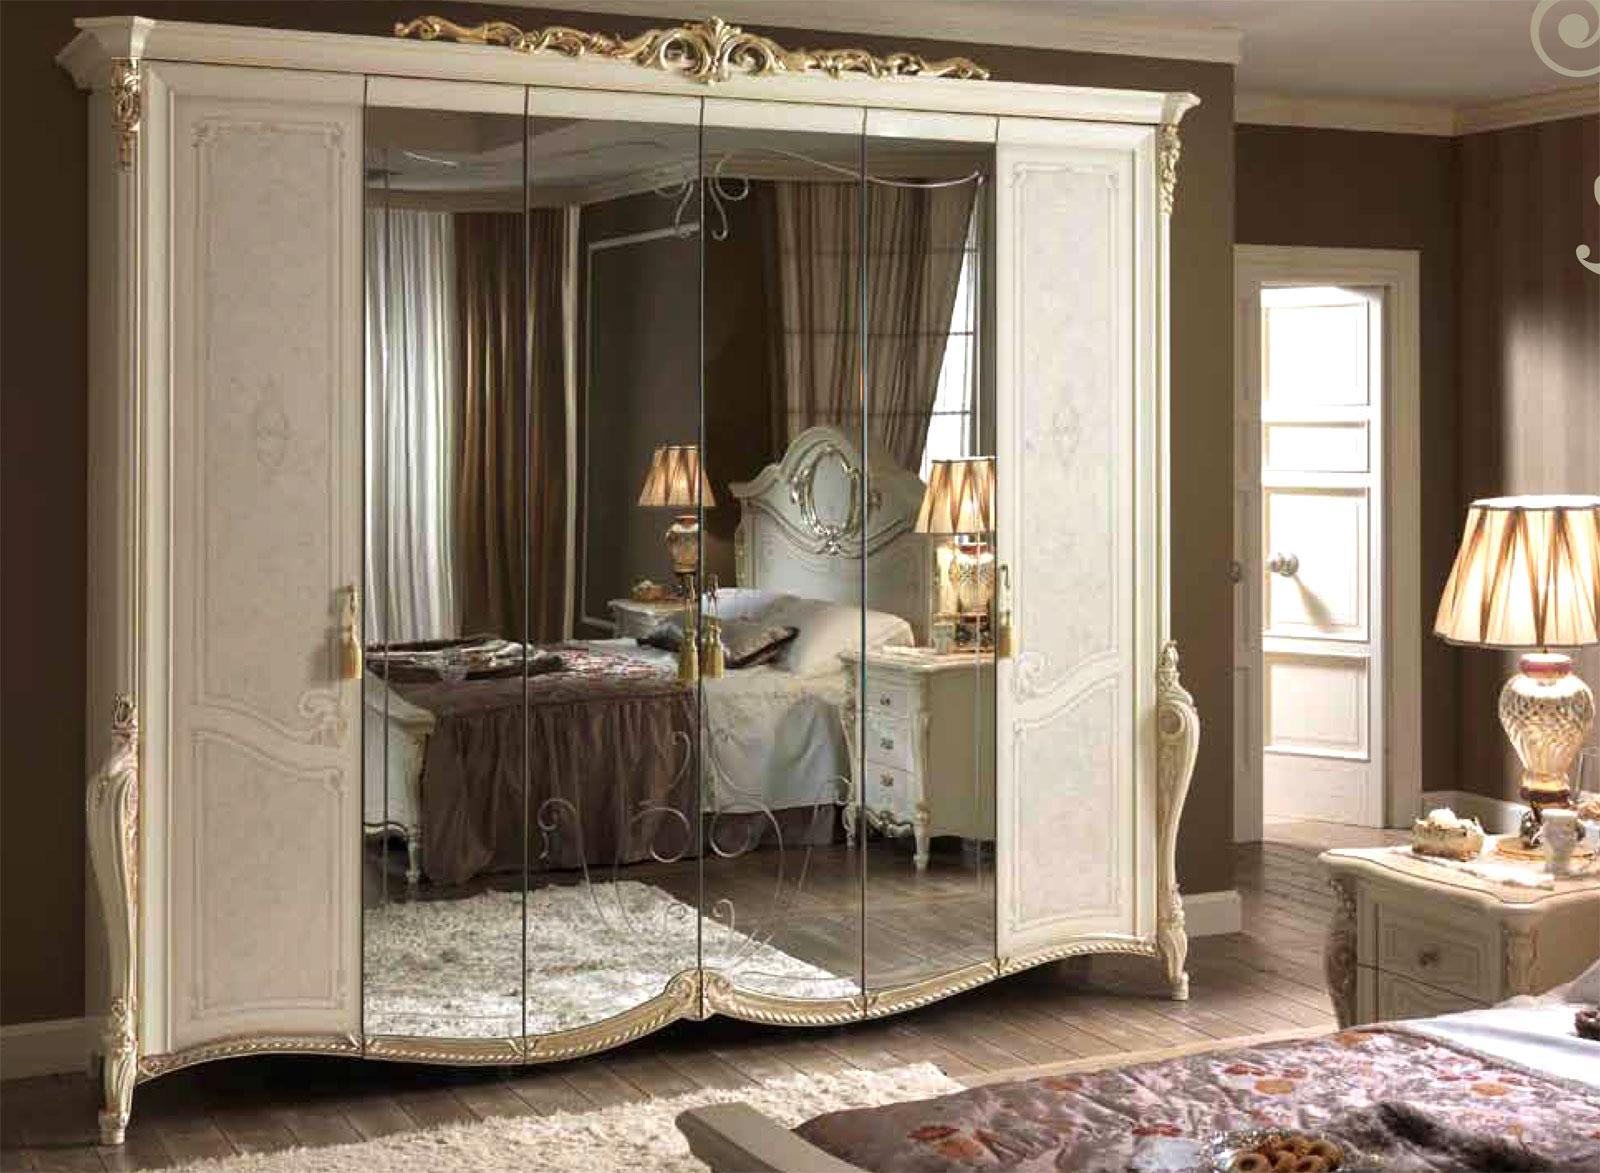 luxus kleiderschrank tiziano klassische stilm bel. Black Bedroom Furniture Sets. Home Design Ideas